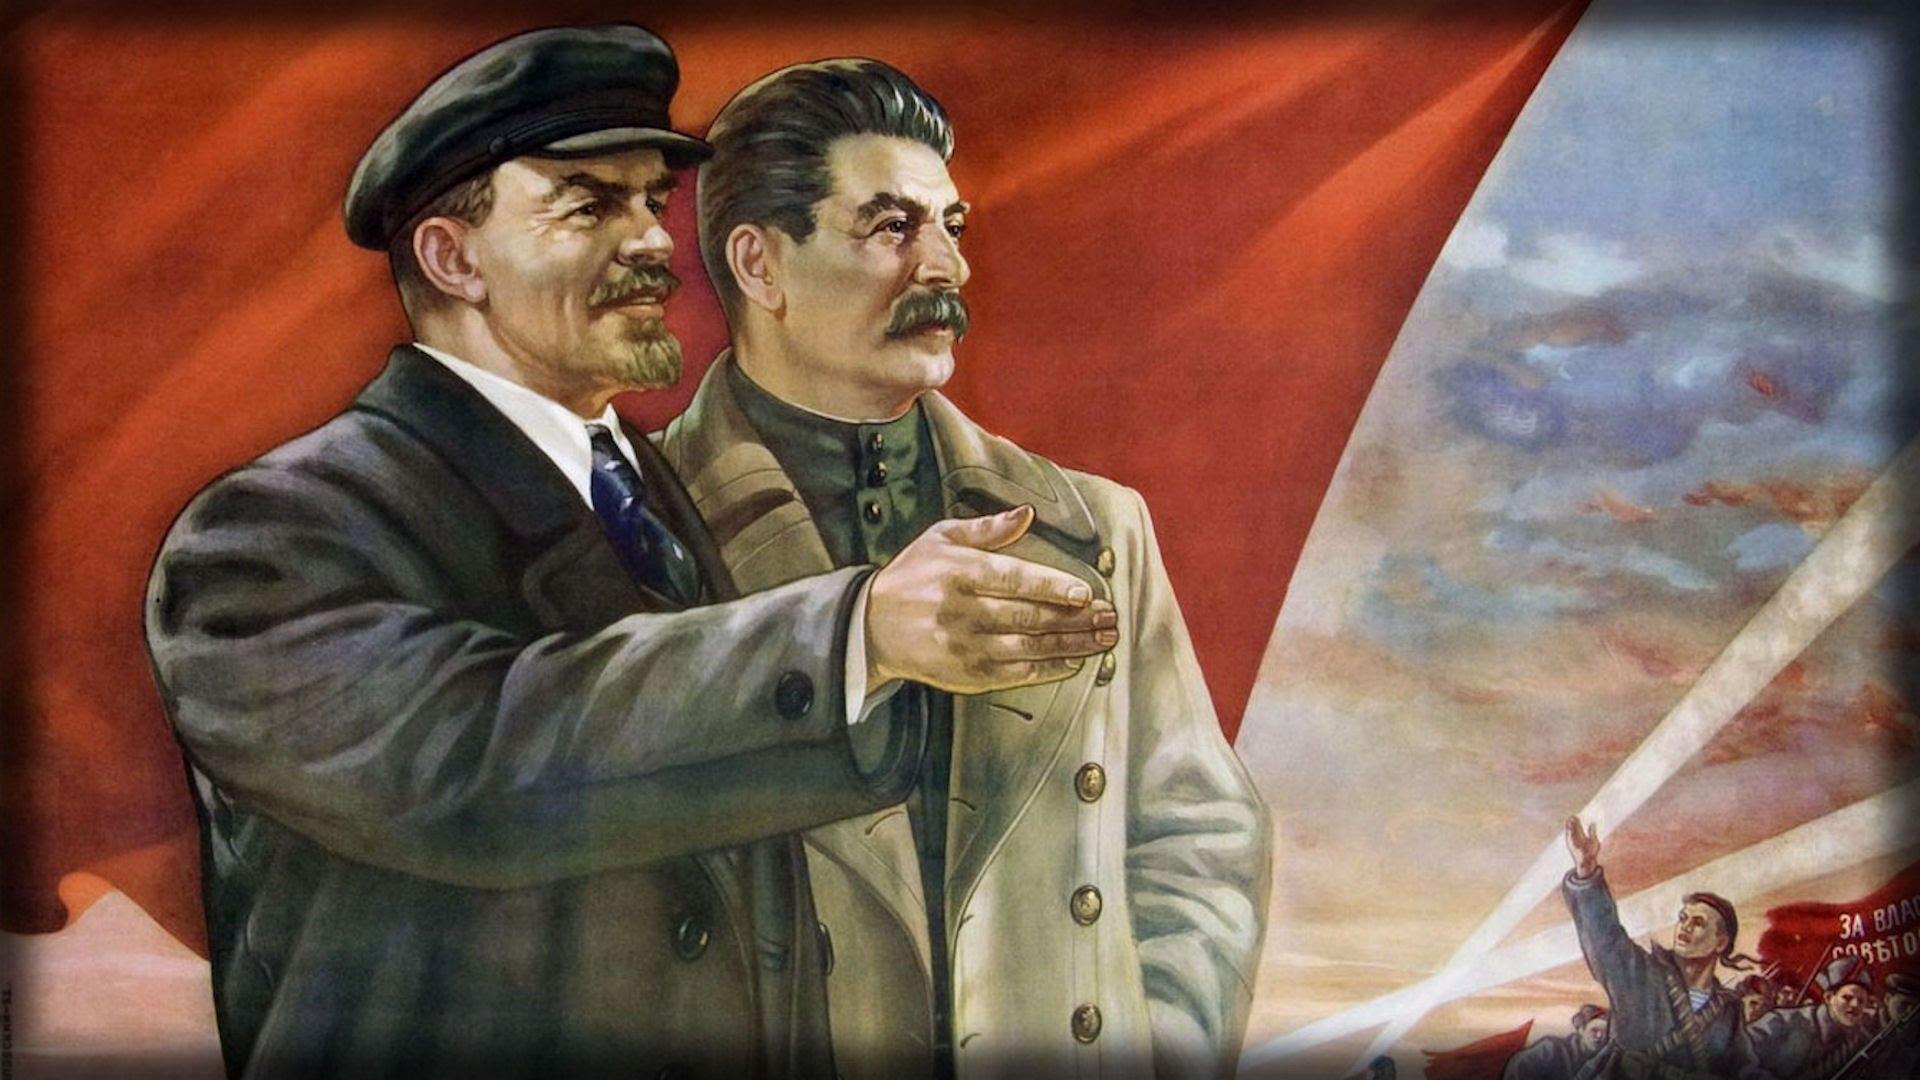 http://rusinros.ru/wp-content/uploads/229285.jpg